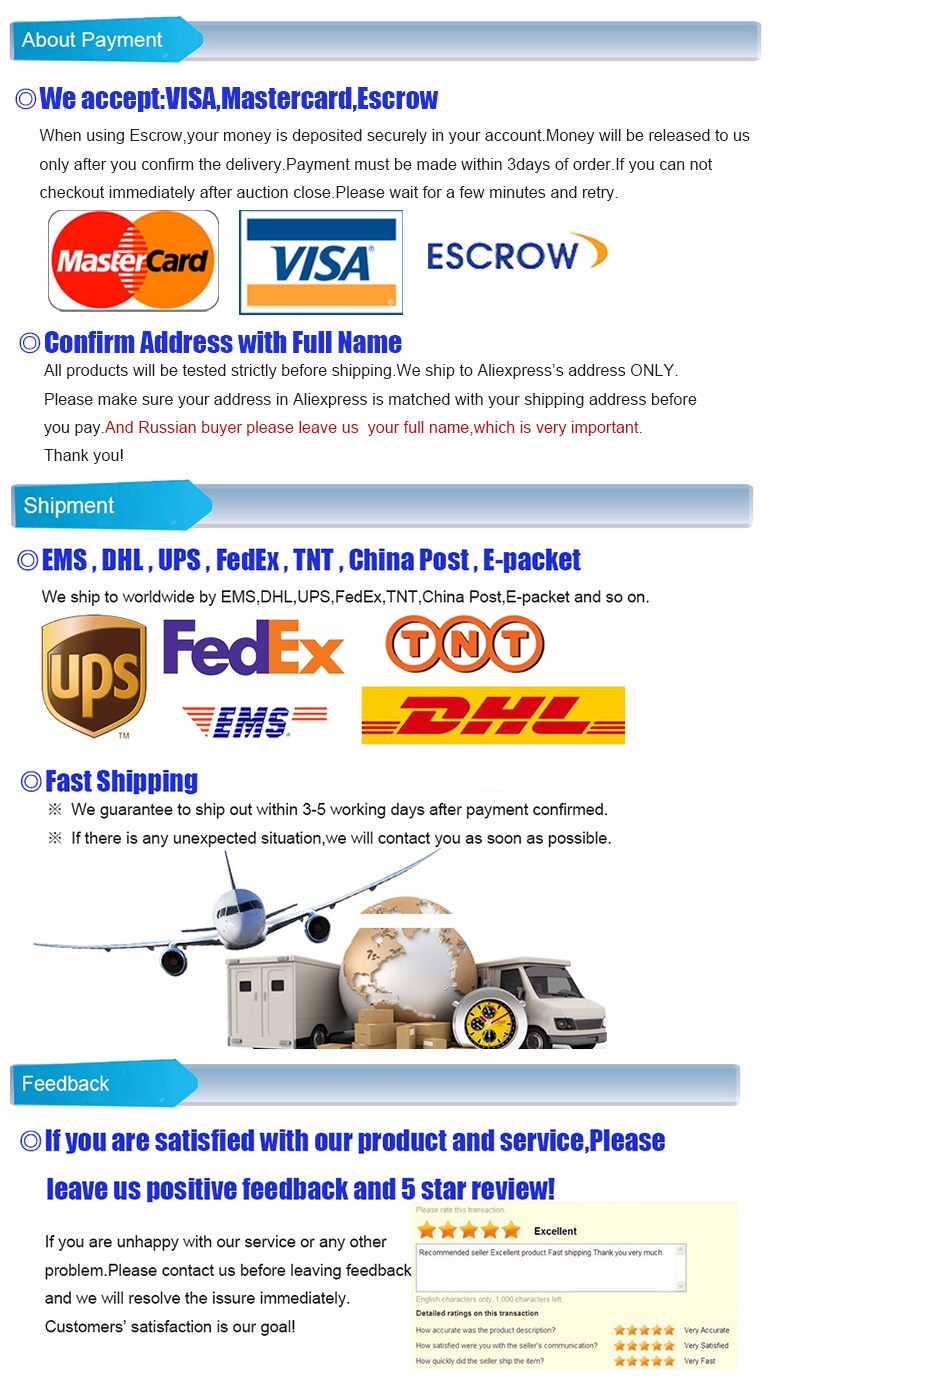 payment shippment OK